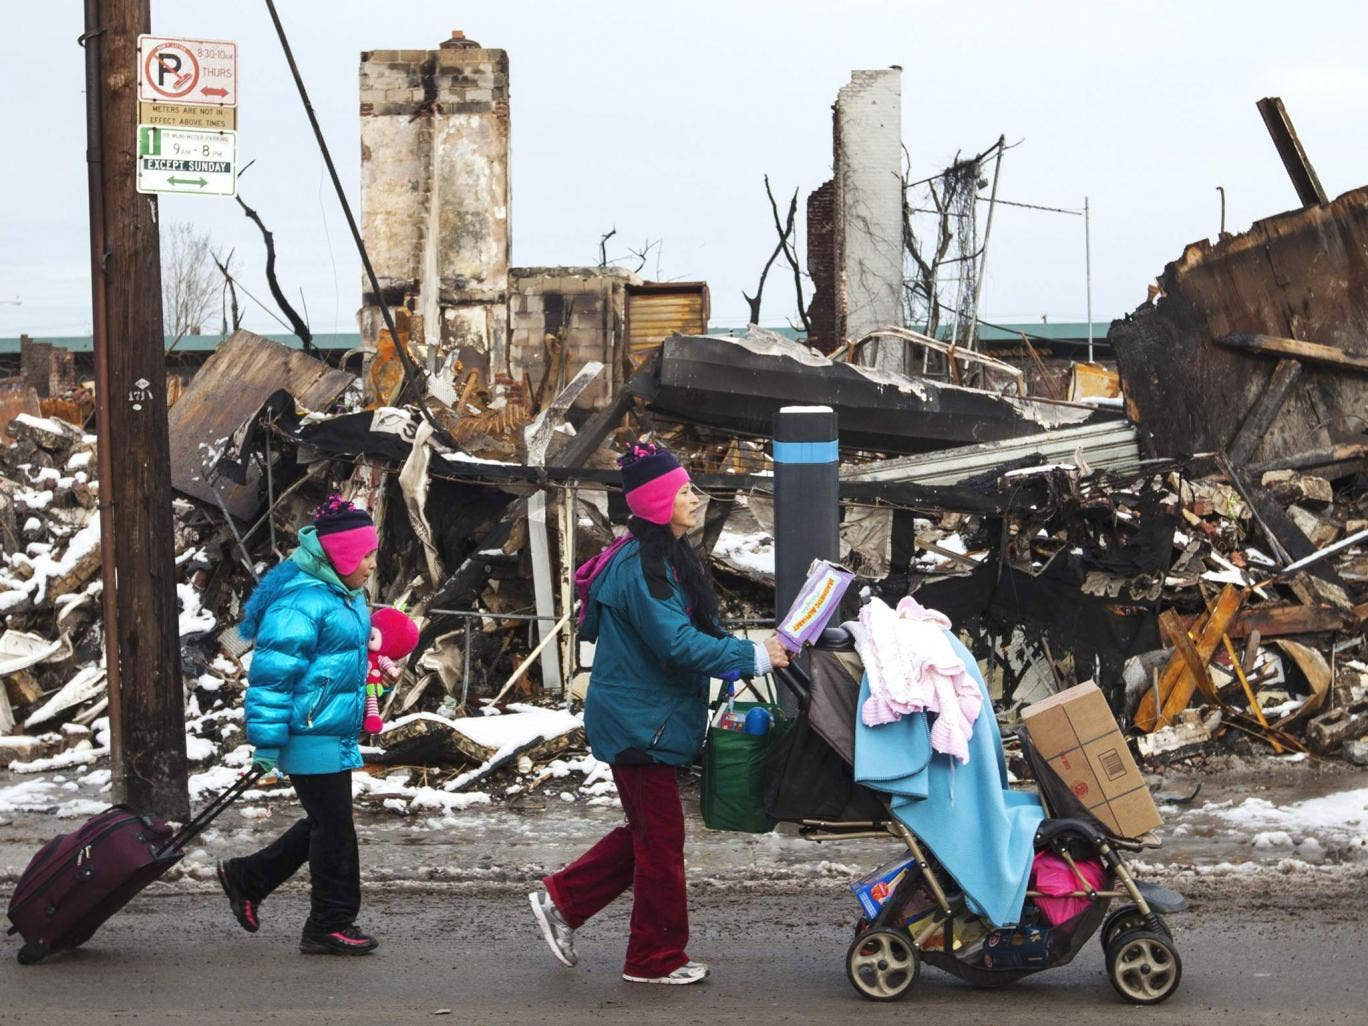 The aftermath of Hurricane Sandy in the Queens neighborhood of Rockaway Park